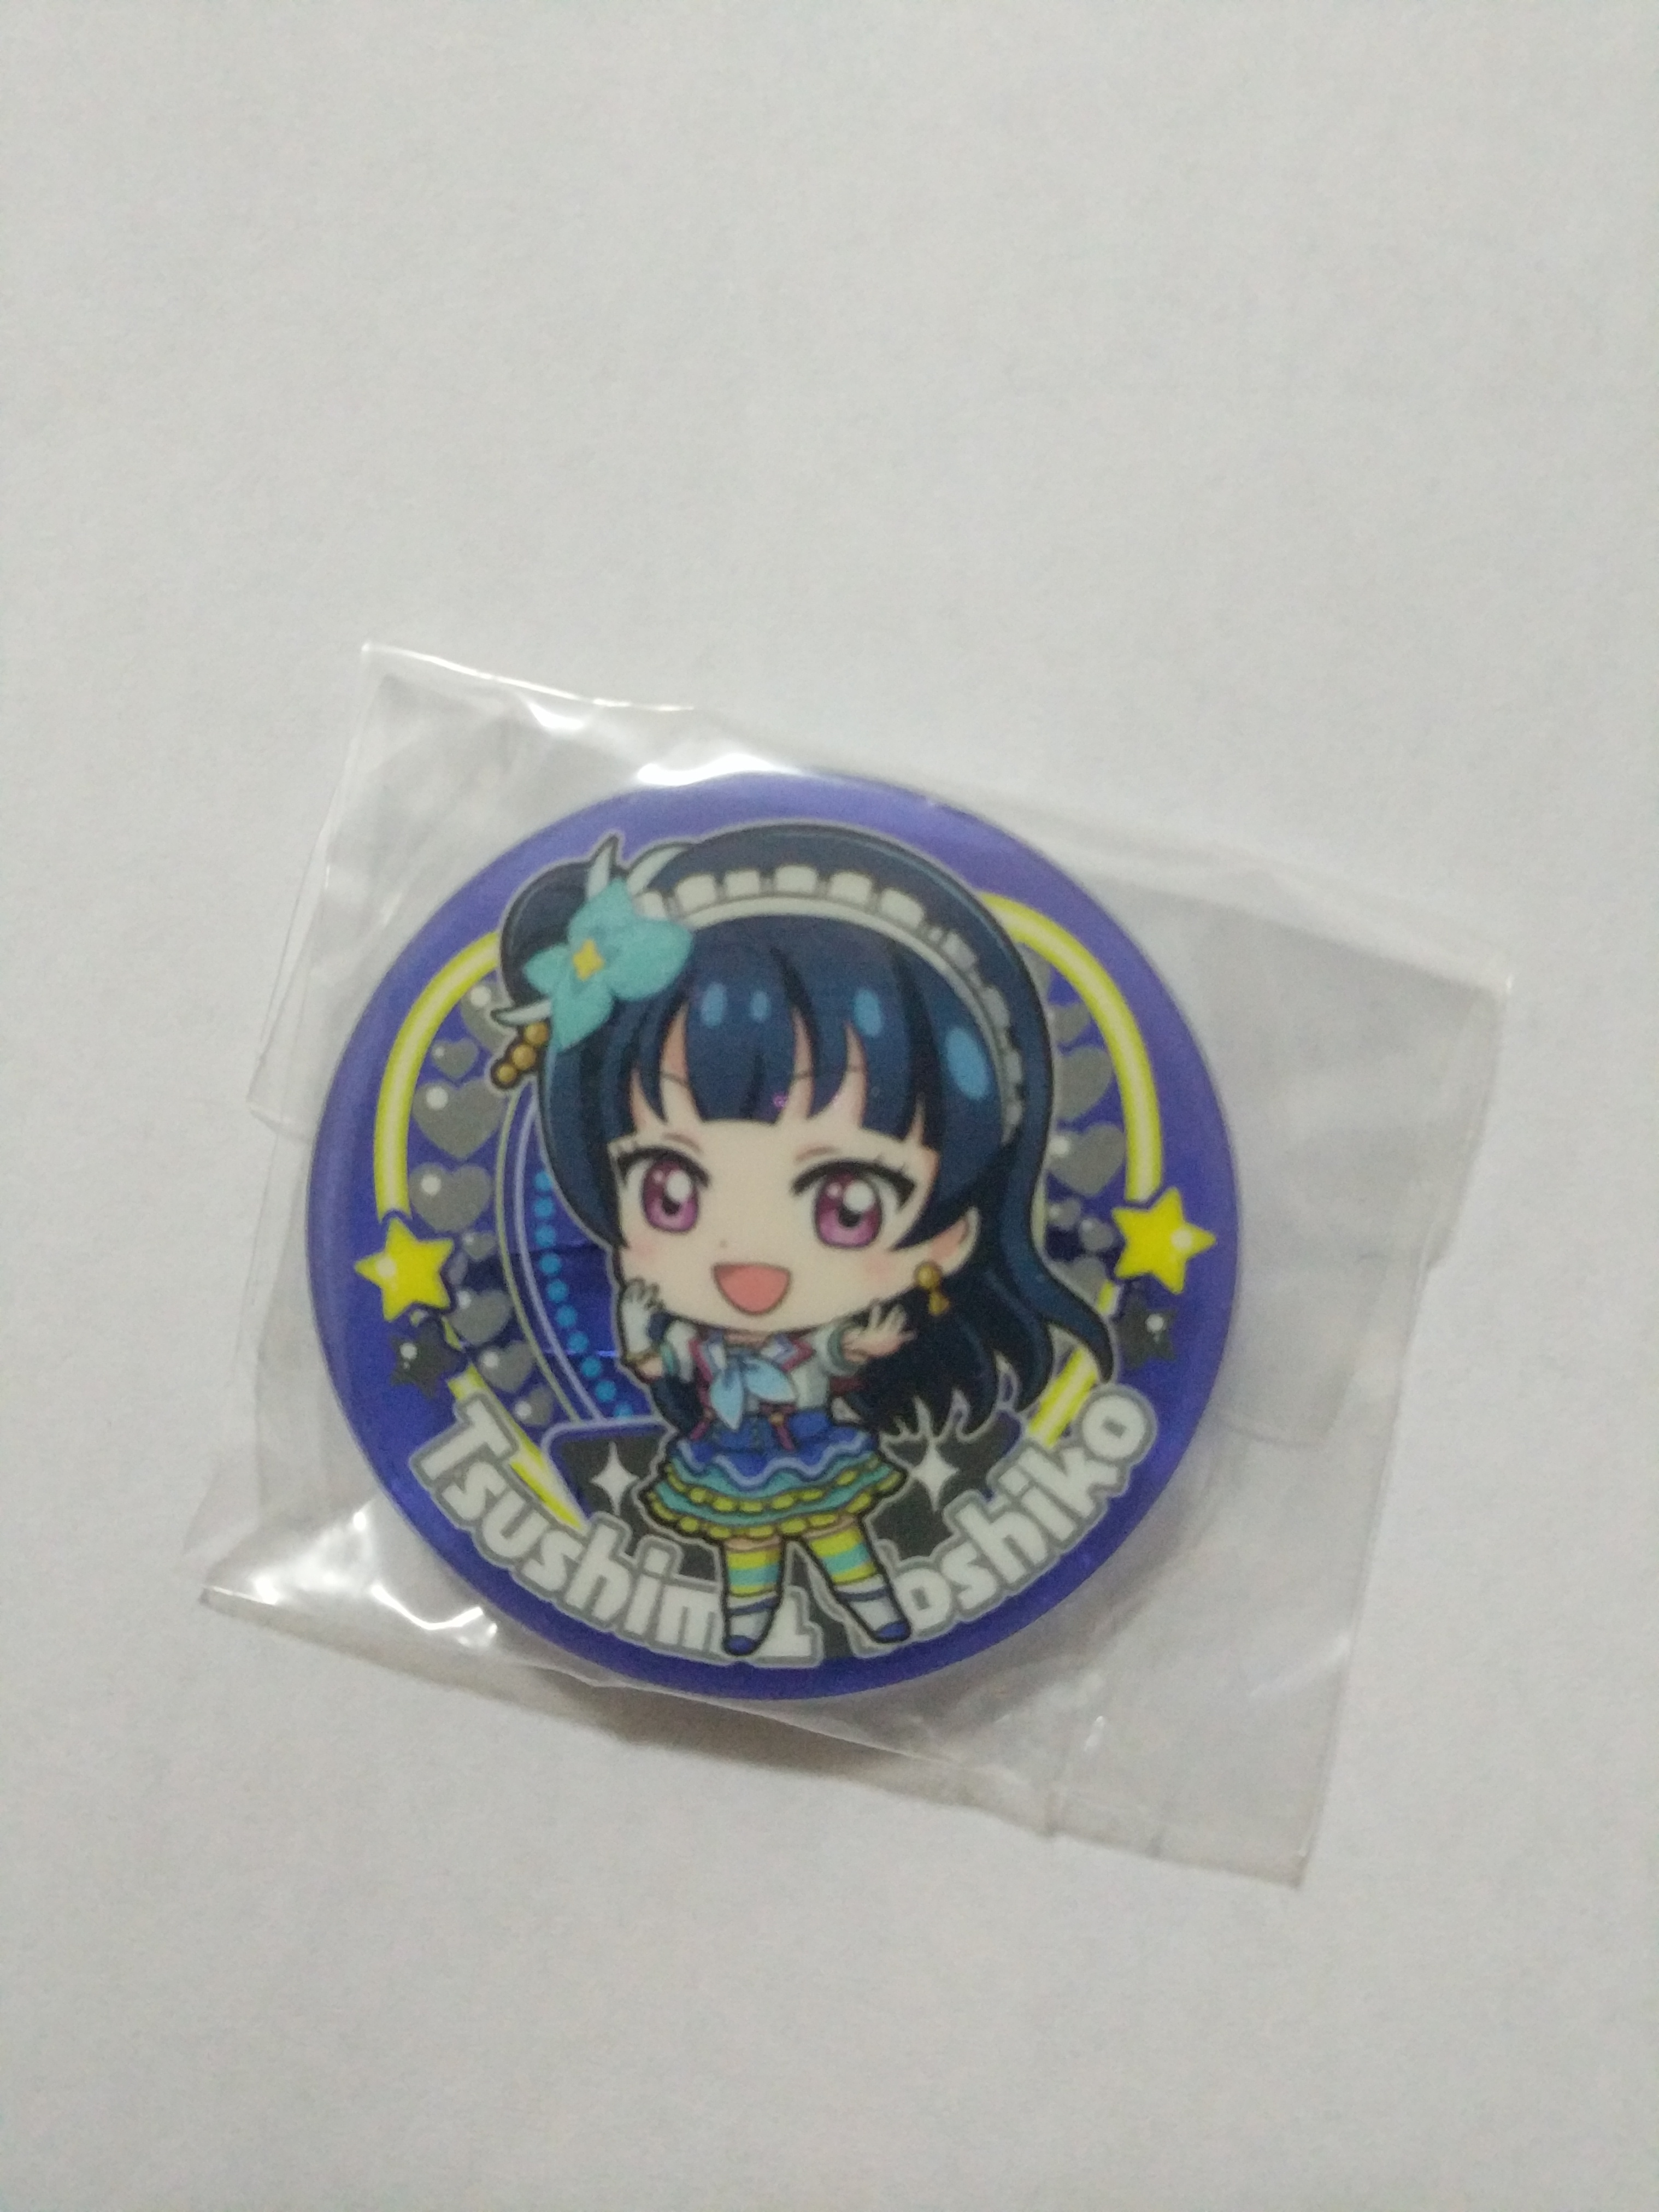 Yohane Aozora Jumping Heart acrylic badge